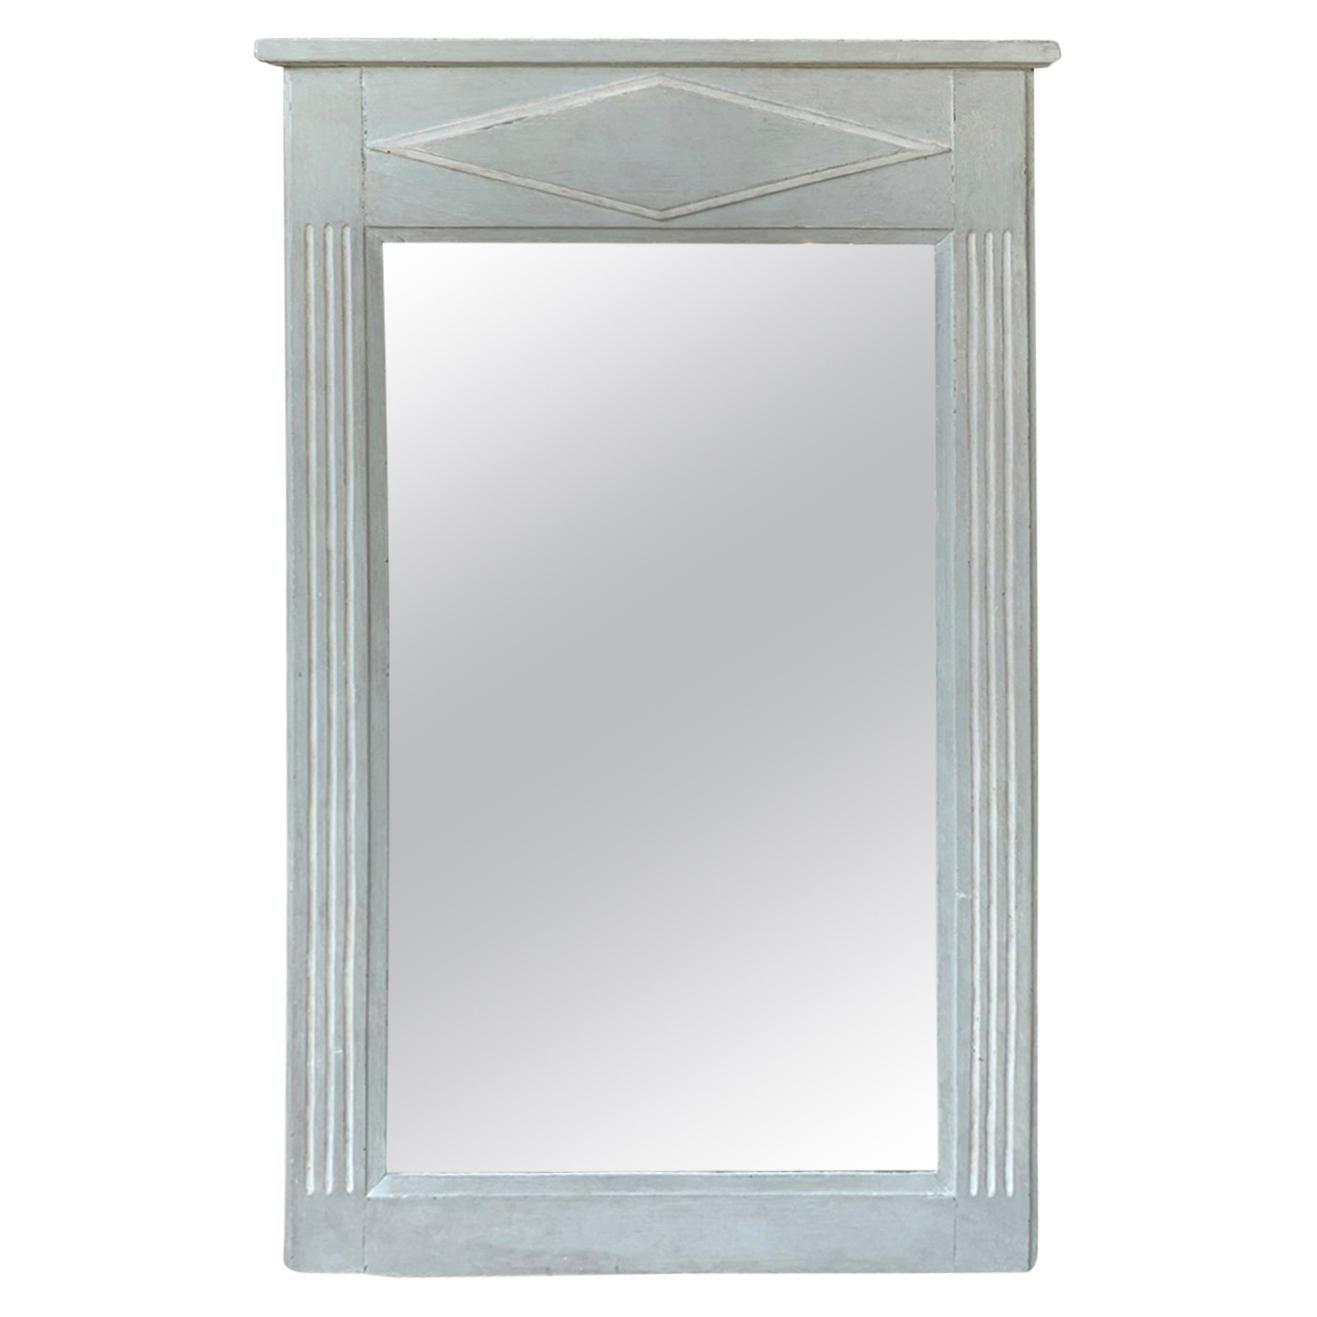 19th-20th Century Continental Mirror with Inlaid Diamond, Custom Finish